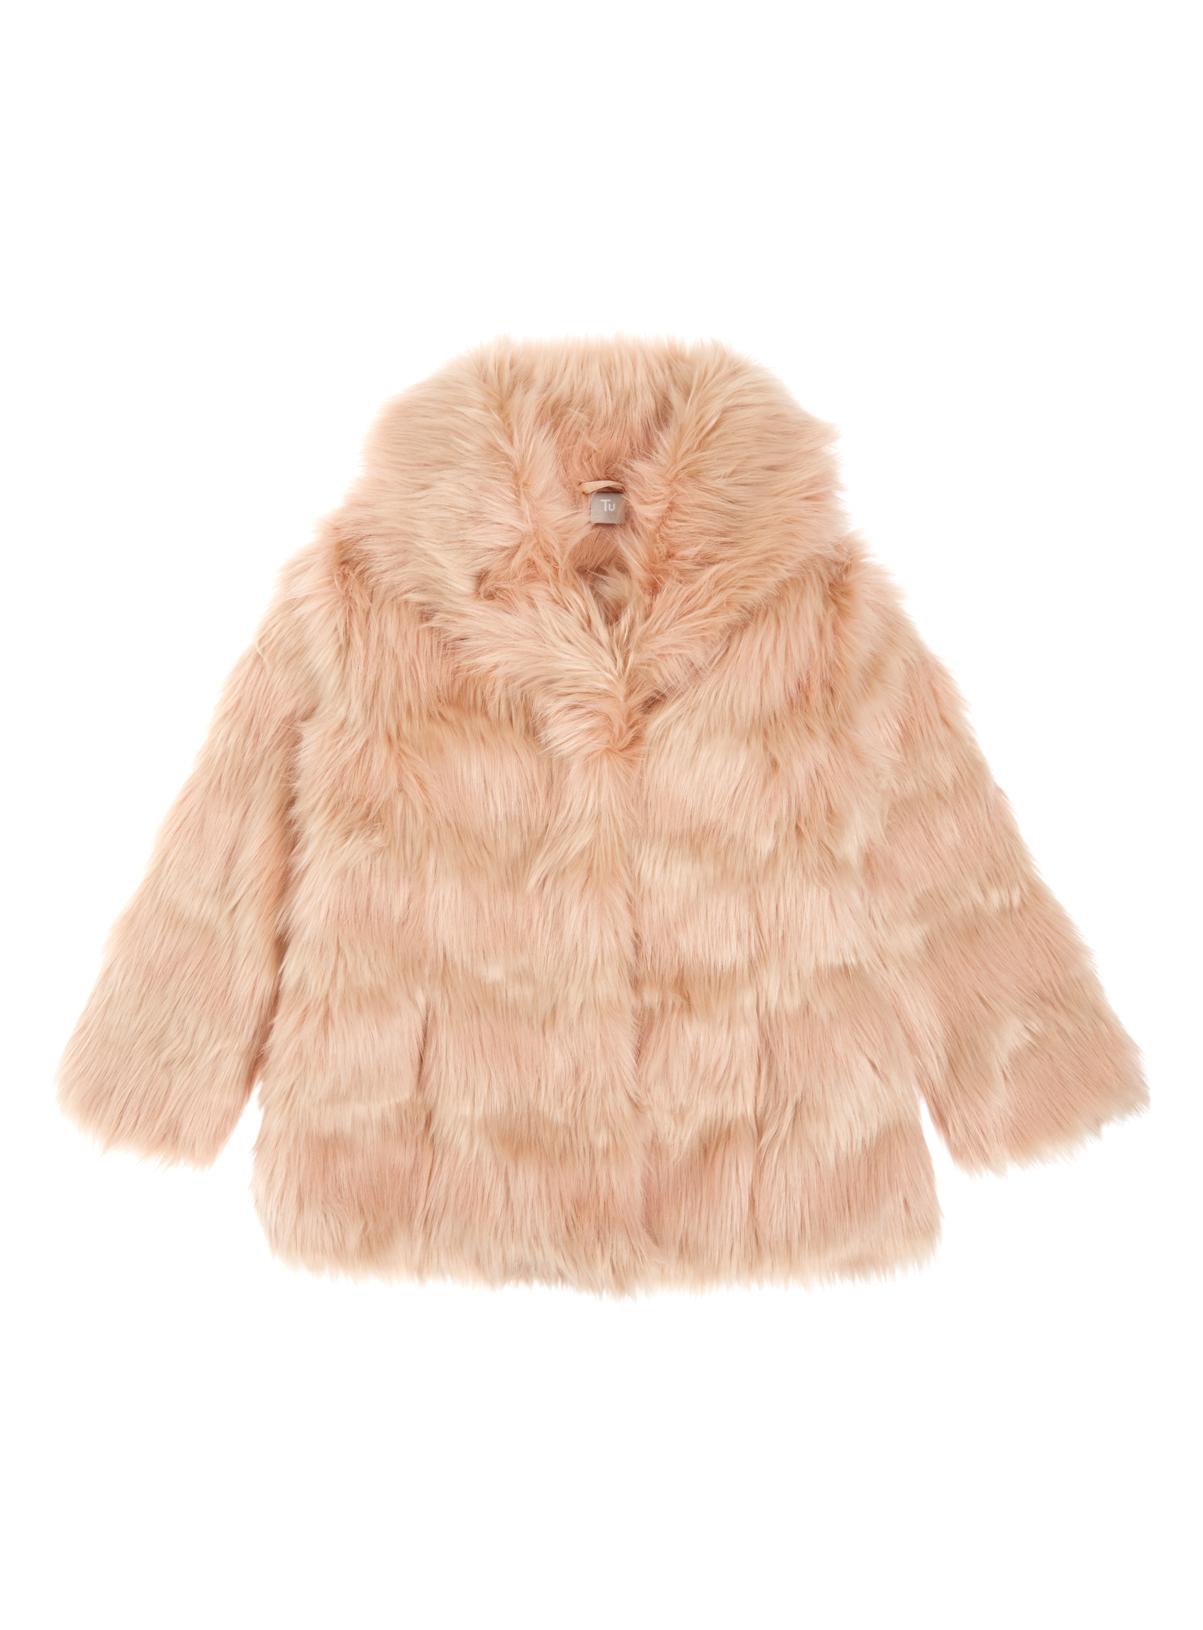 All Girl's Clothing Girls Pink Faux-Fur Coat (3-12 years)   Tu ...